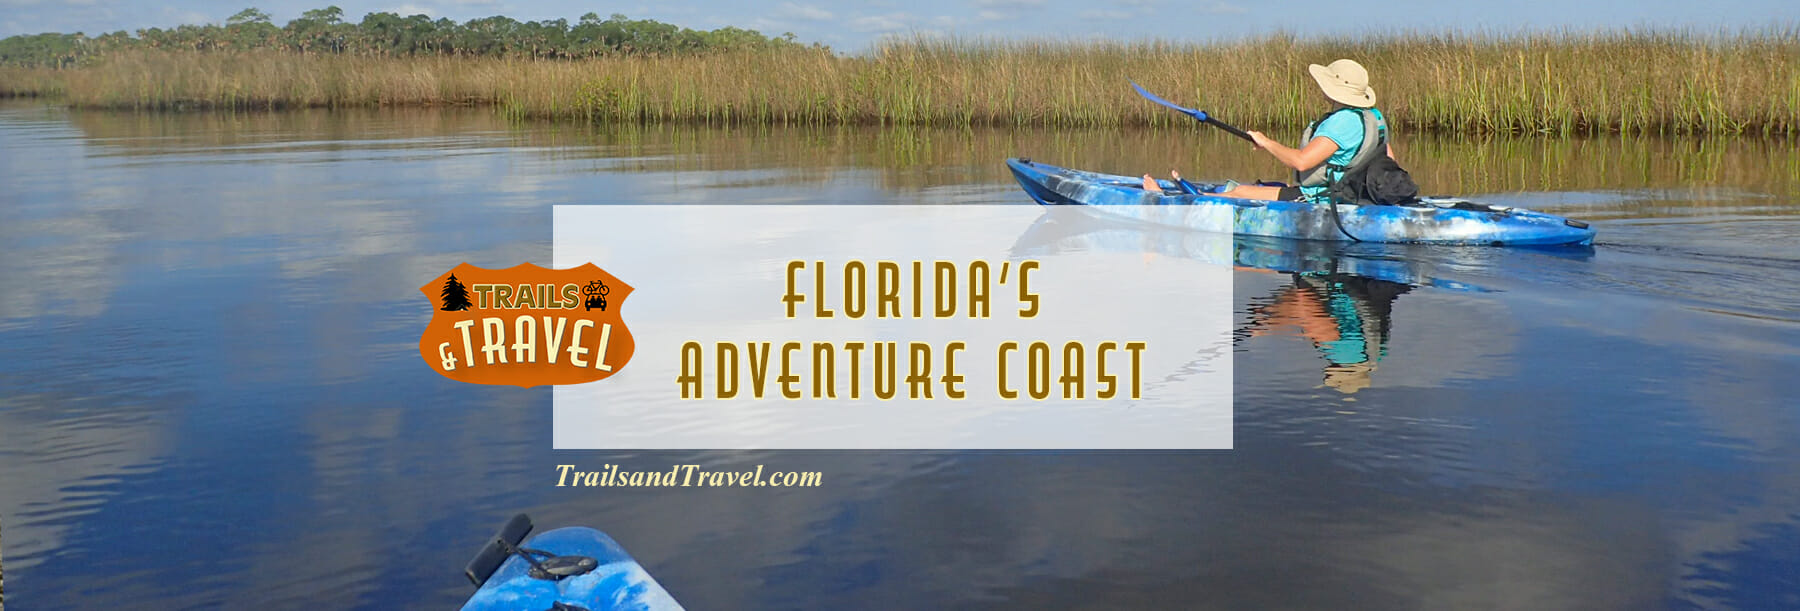 Florida's Adventure Coast